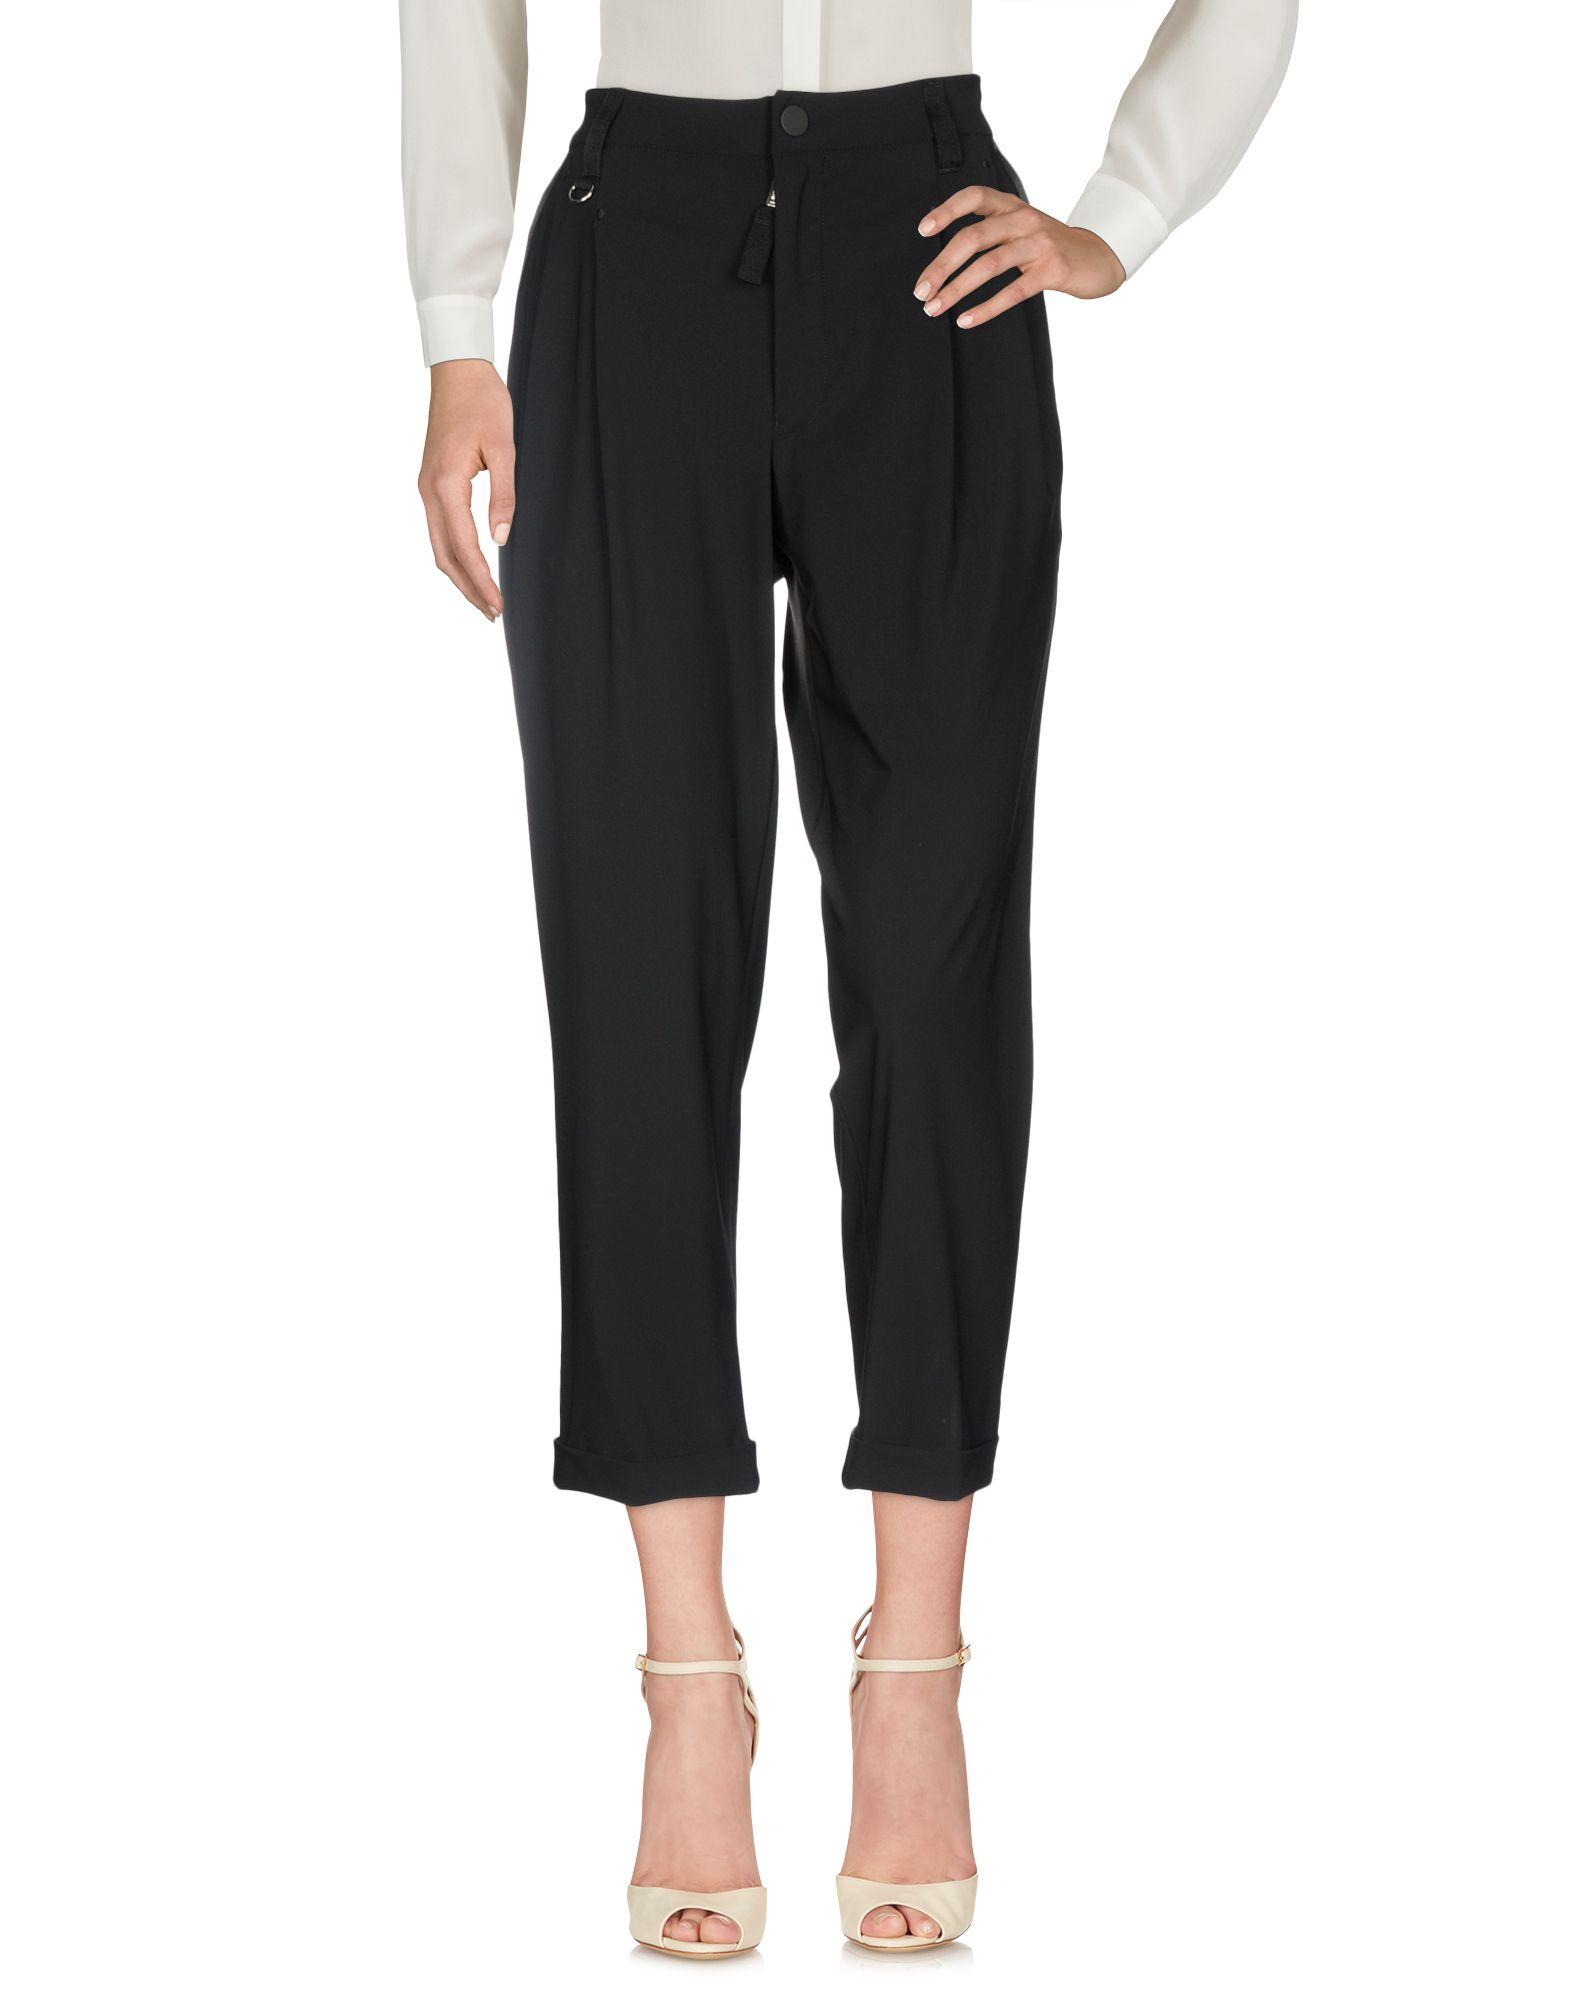 Pantalone High Tech Donna - Acquista online su XNkjl